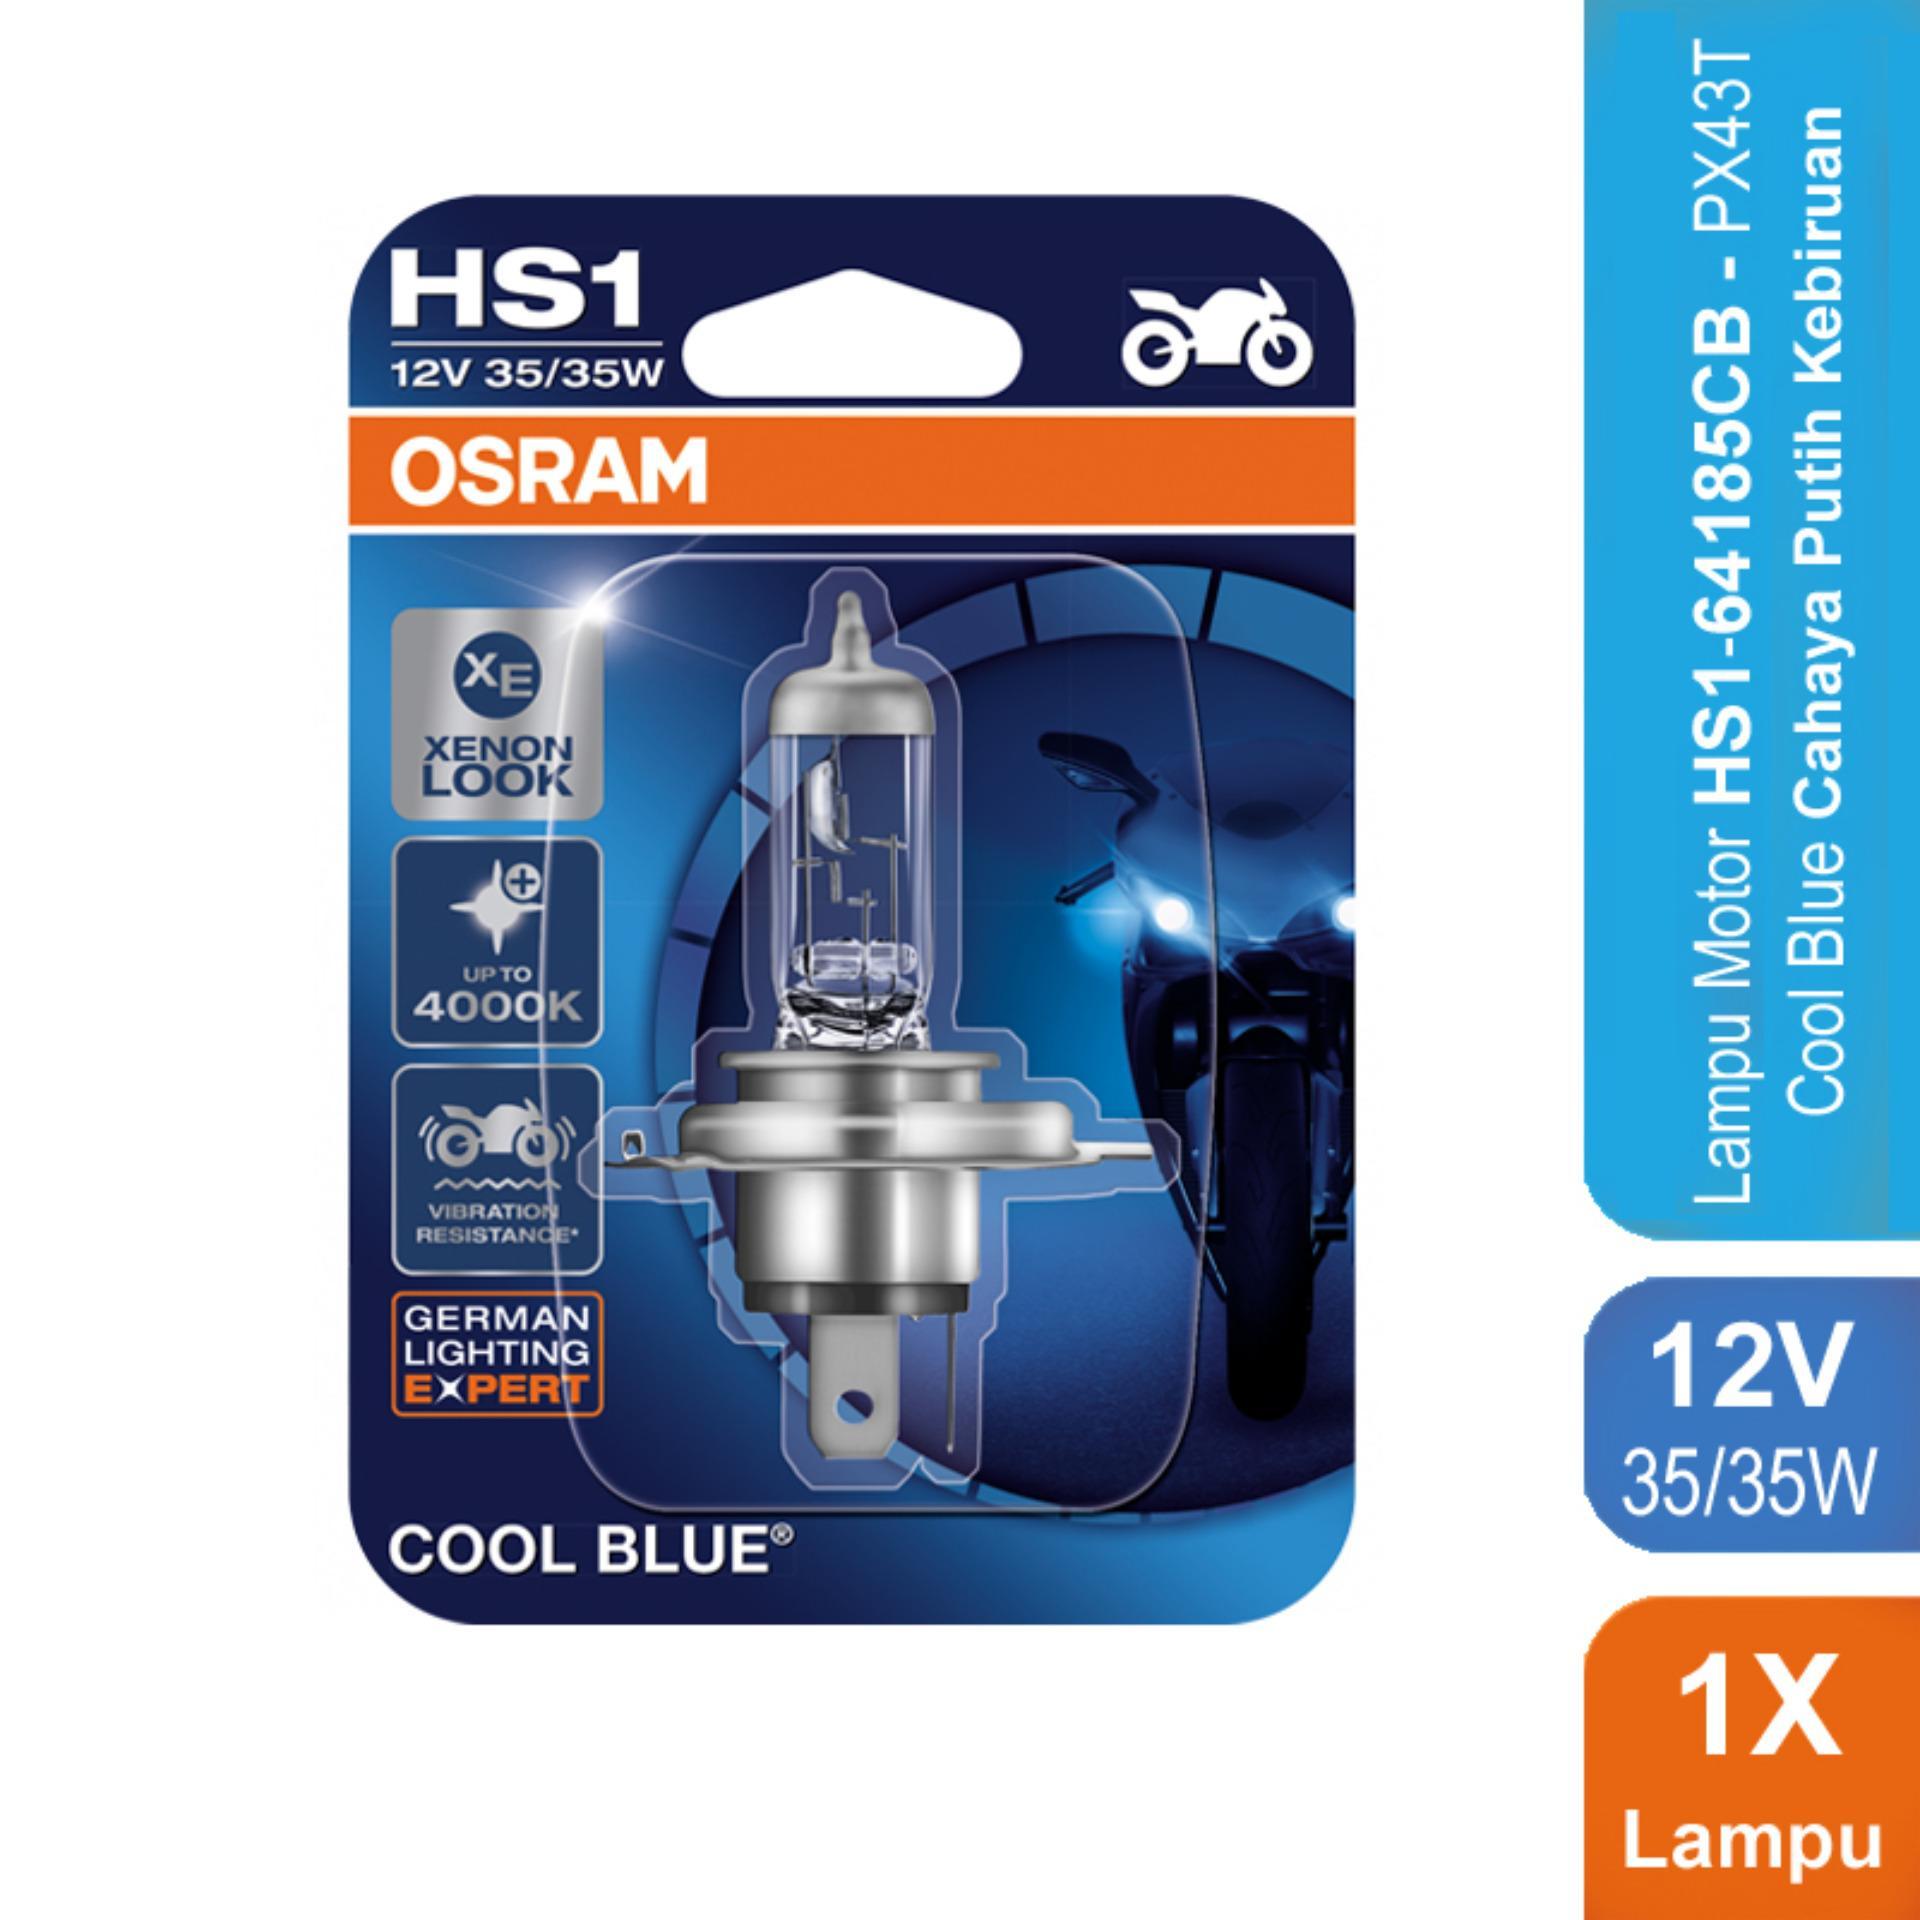 Osram Lampu Depan Motor HS1 64185CB 12V 35/35  PX43T - Cool Blue - u/ Motor (vixion, bison)  Murah